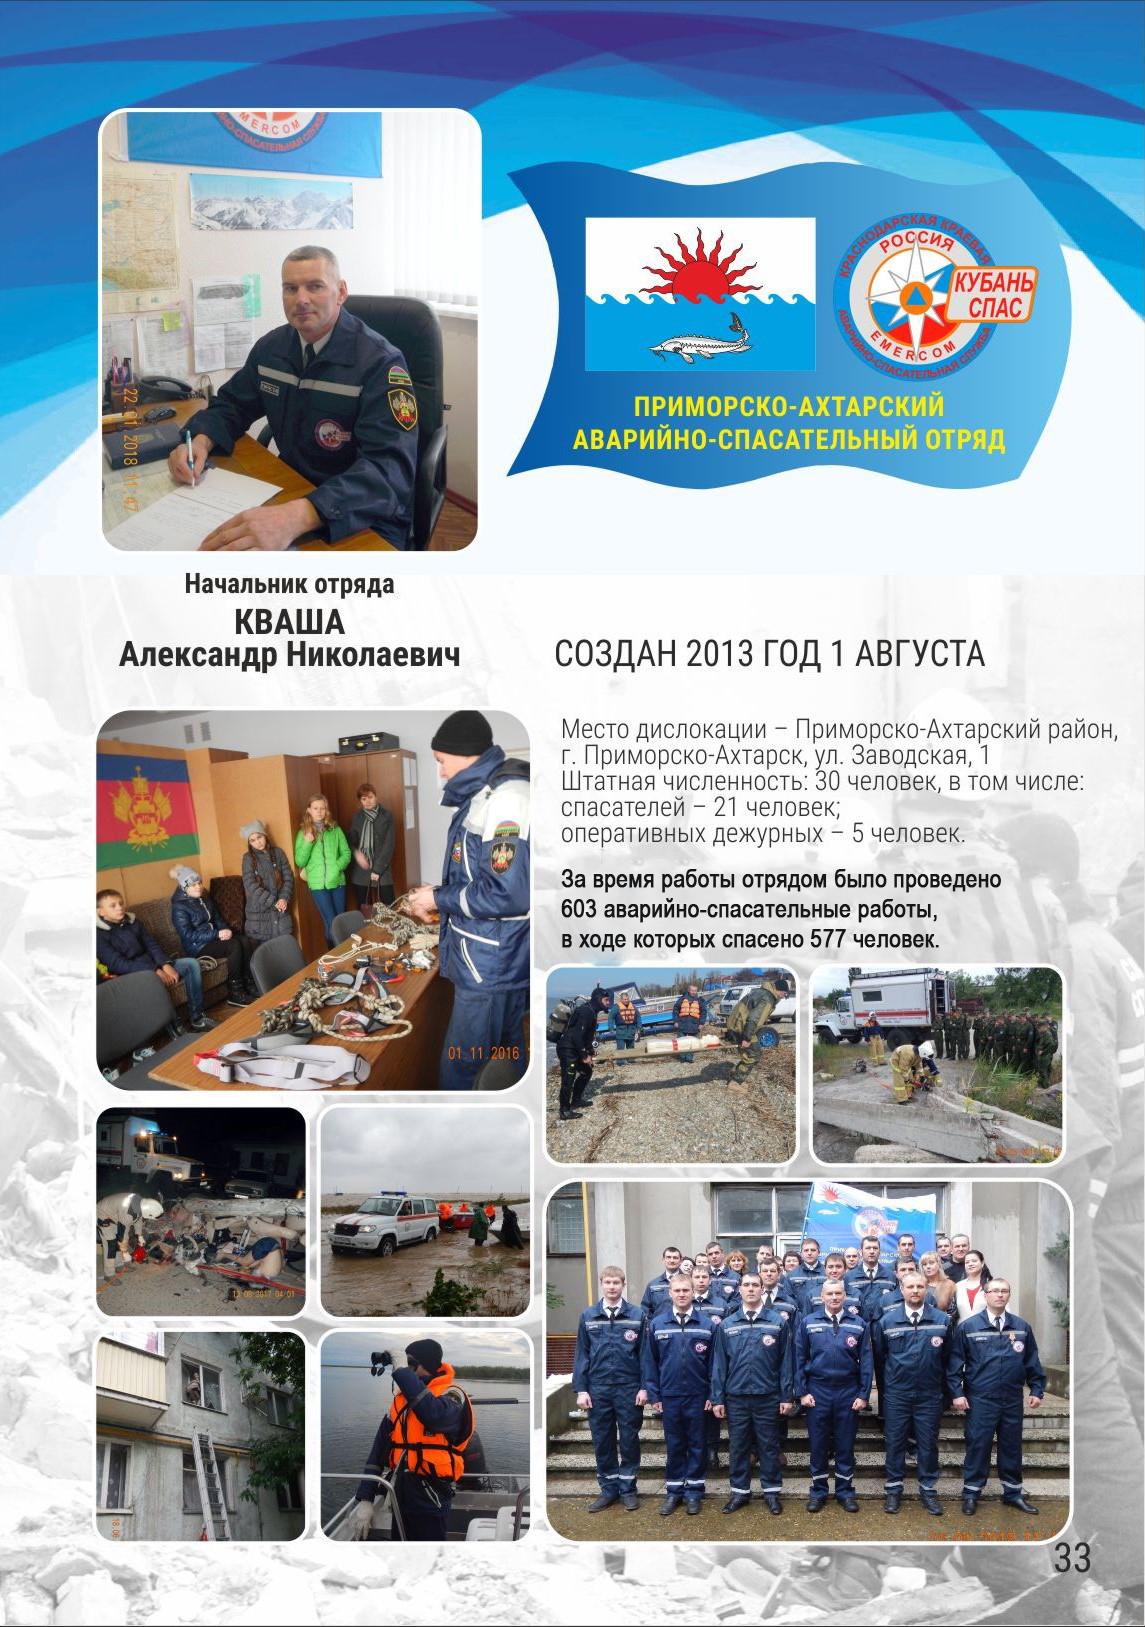 Приморско-Ахтарский АСО